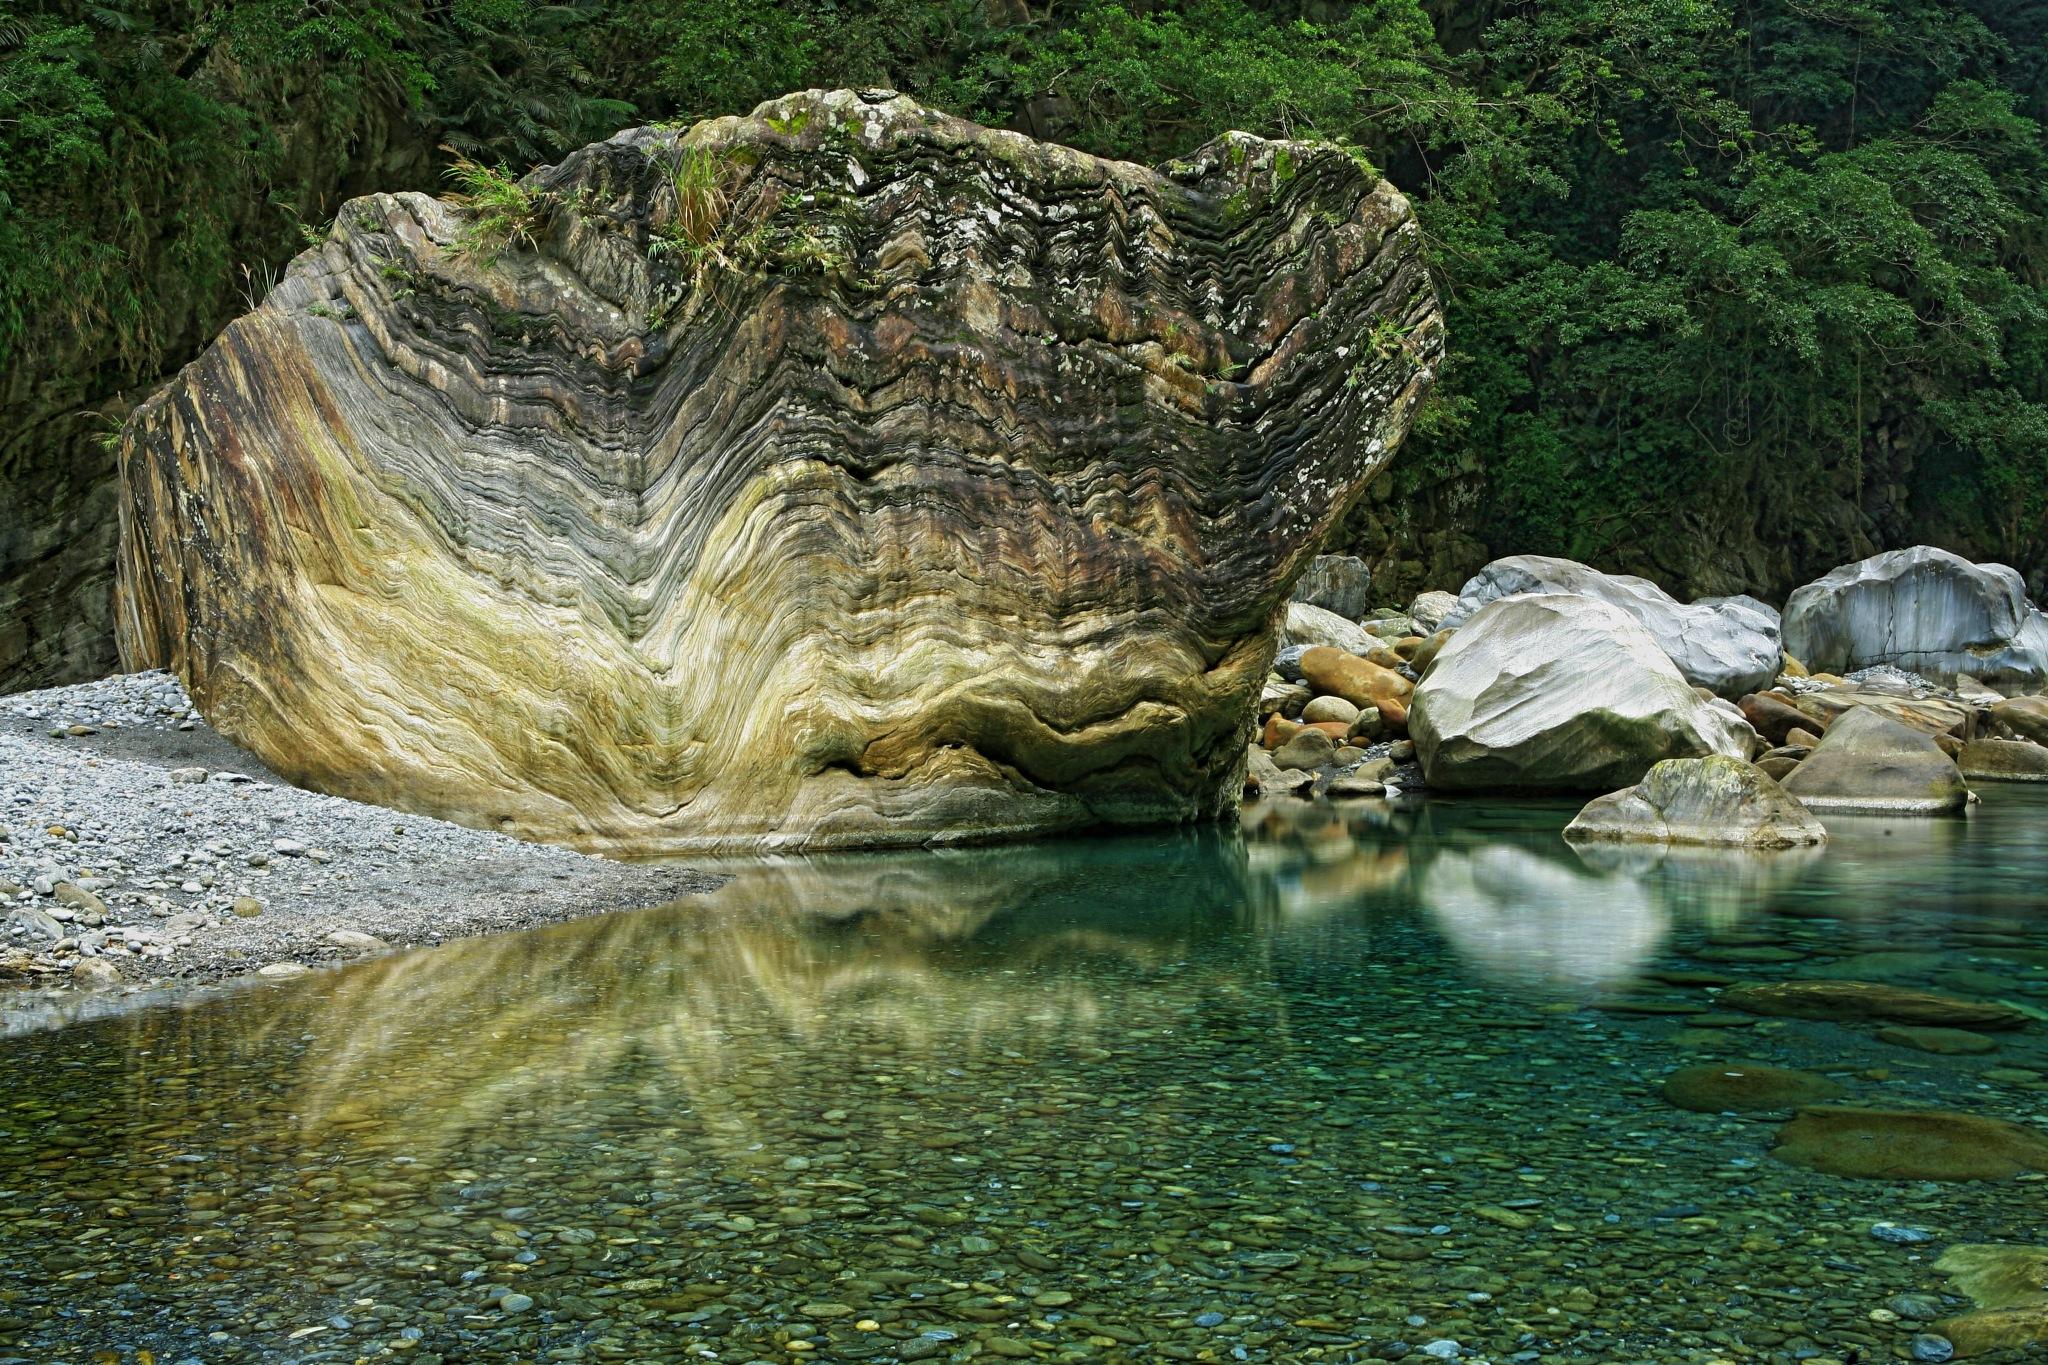 Marble and Creek by leecj0129